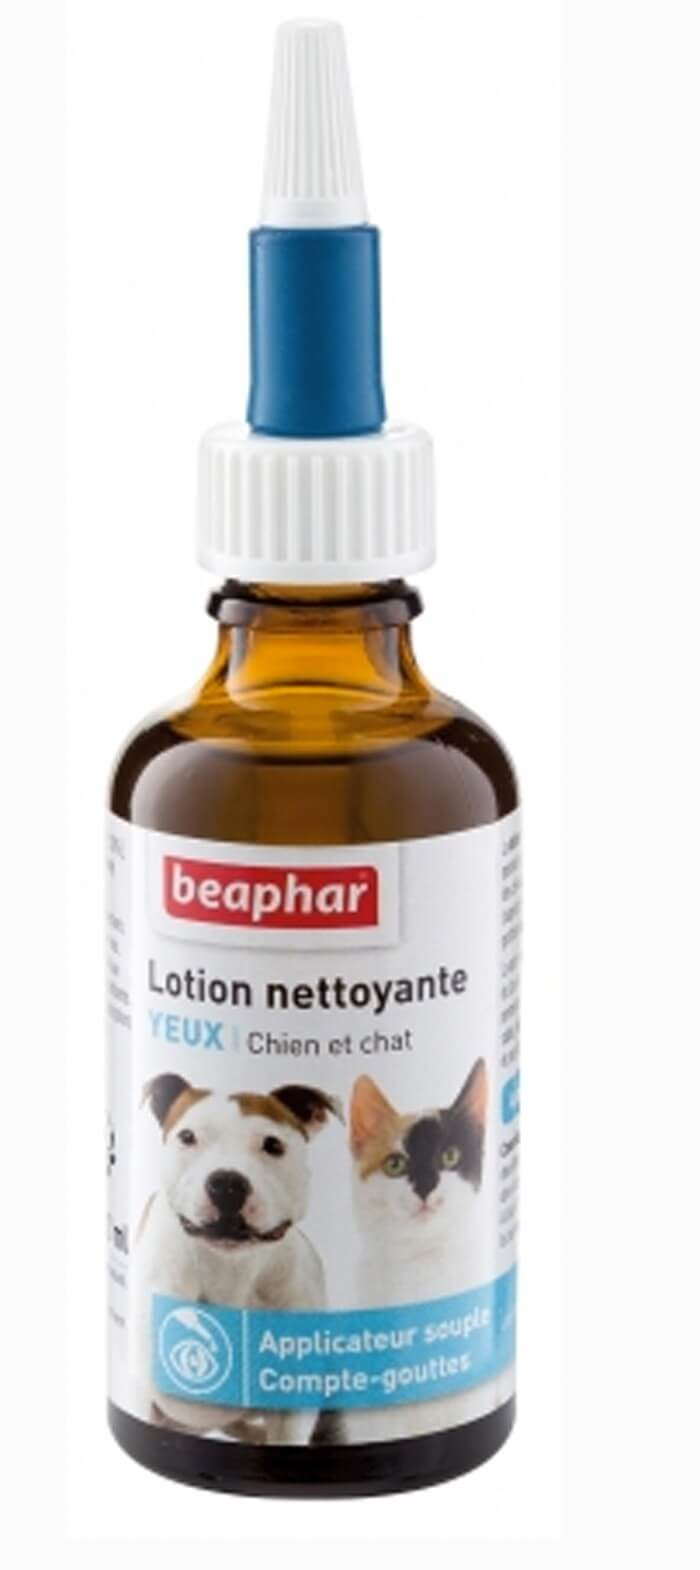 Beaphar Lotion nettoyante yeux 50 ml